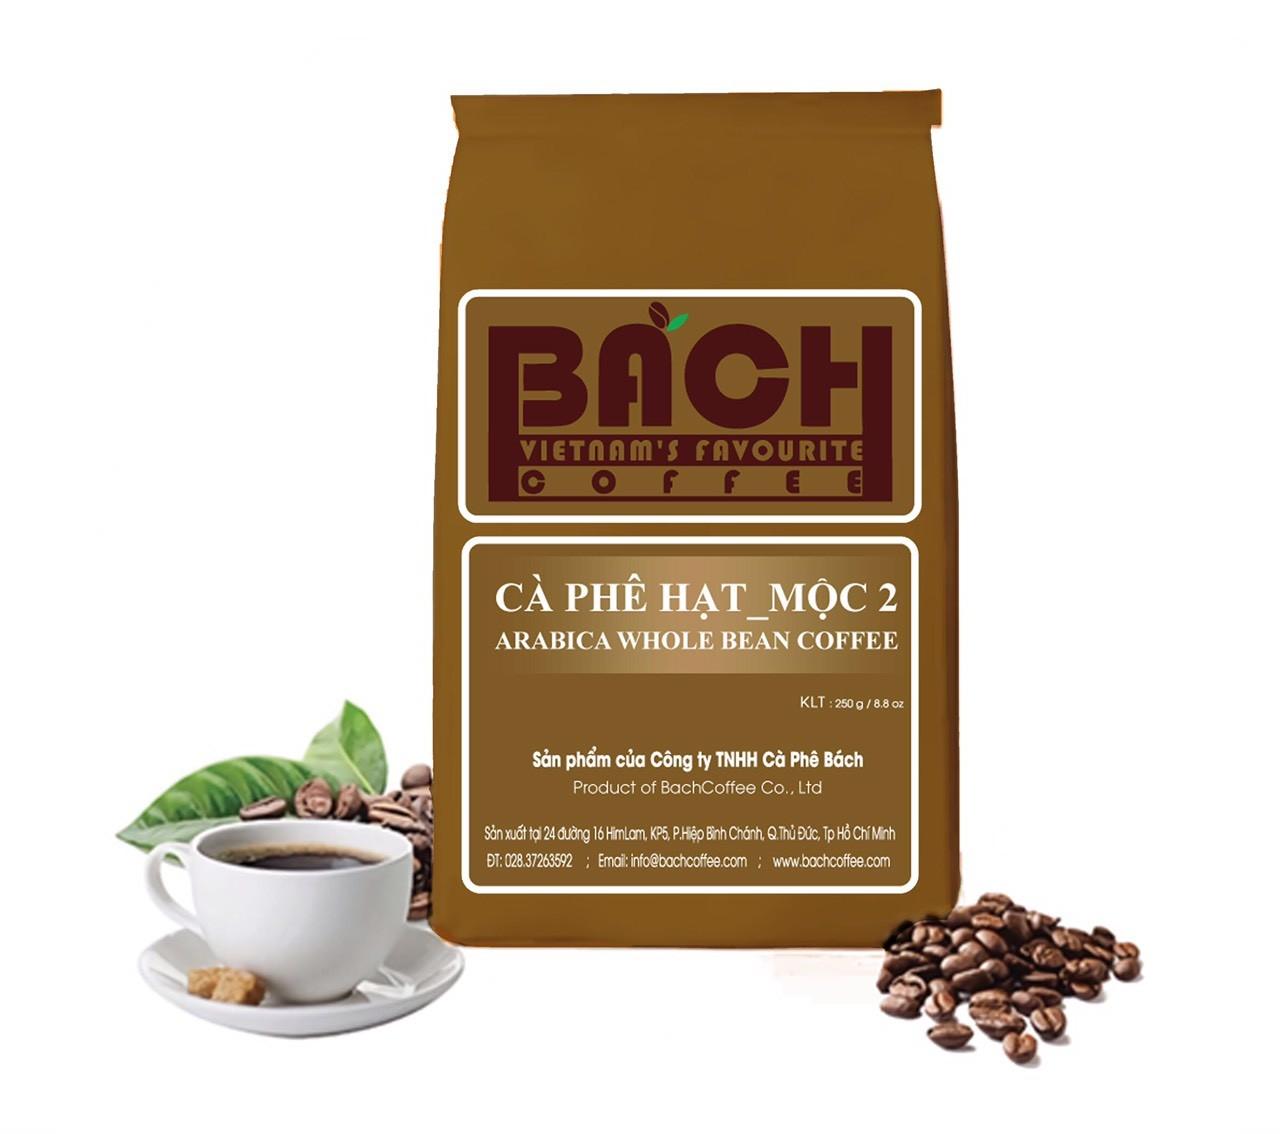 Photo: BachCafe